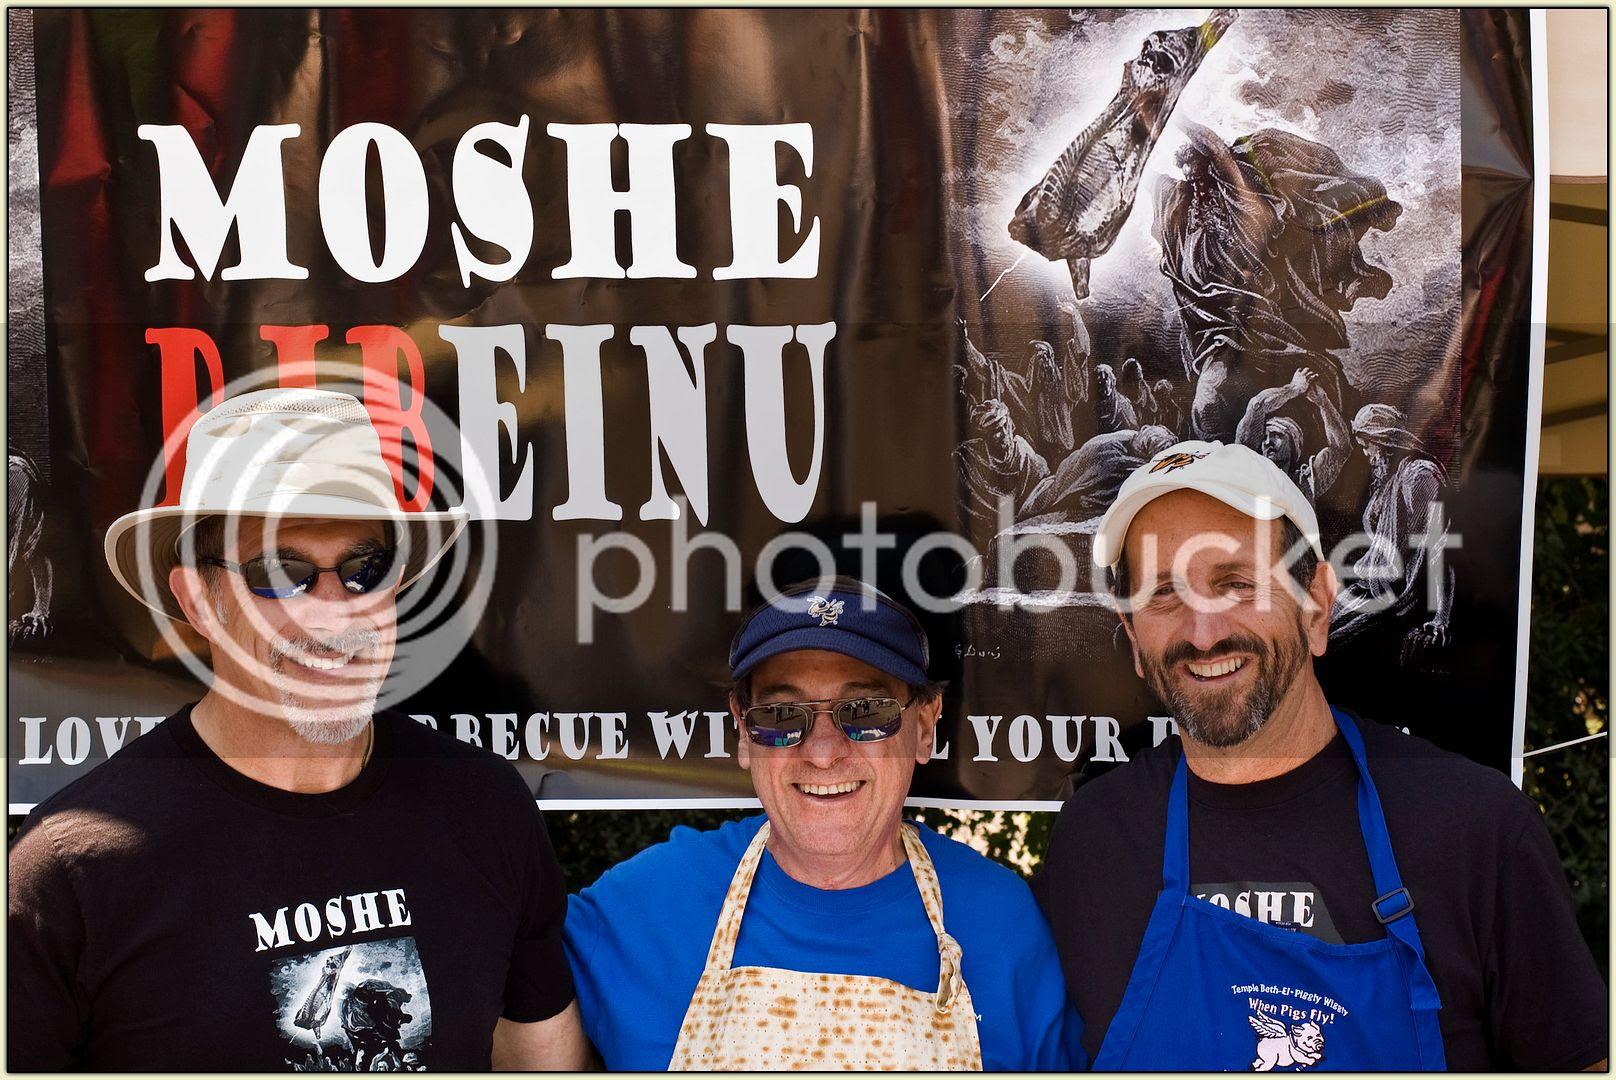 Moshe Ribeinu